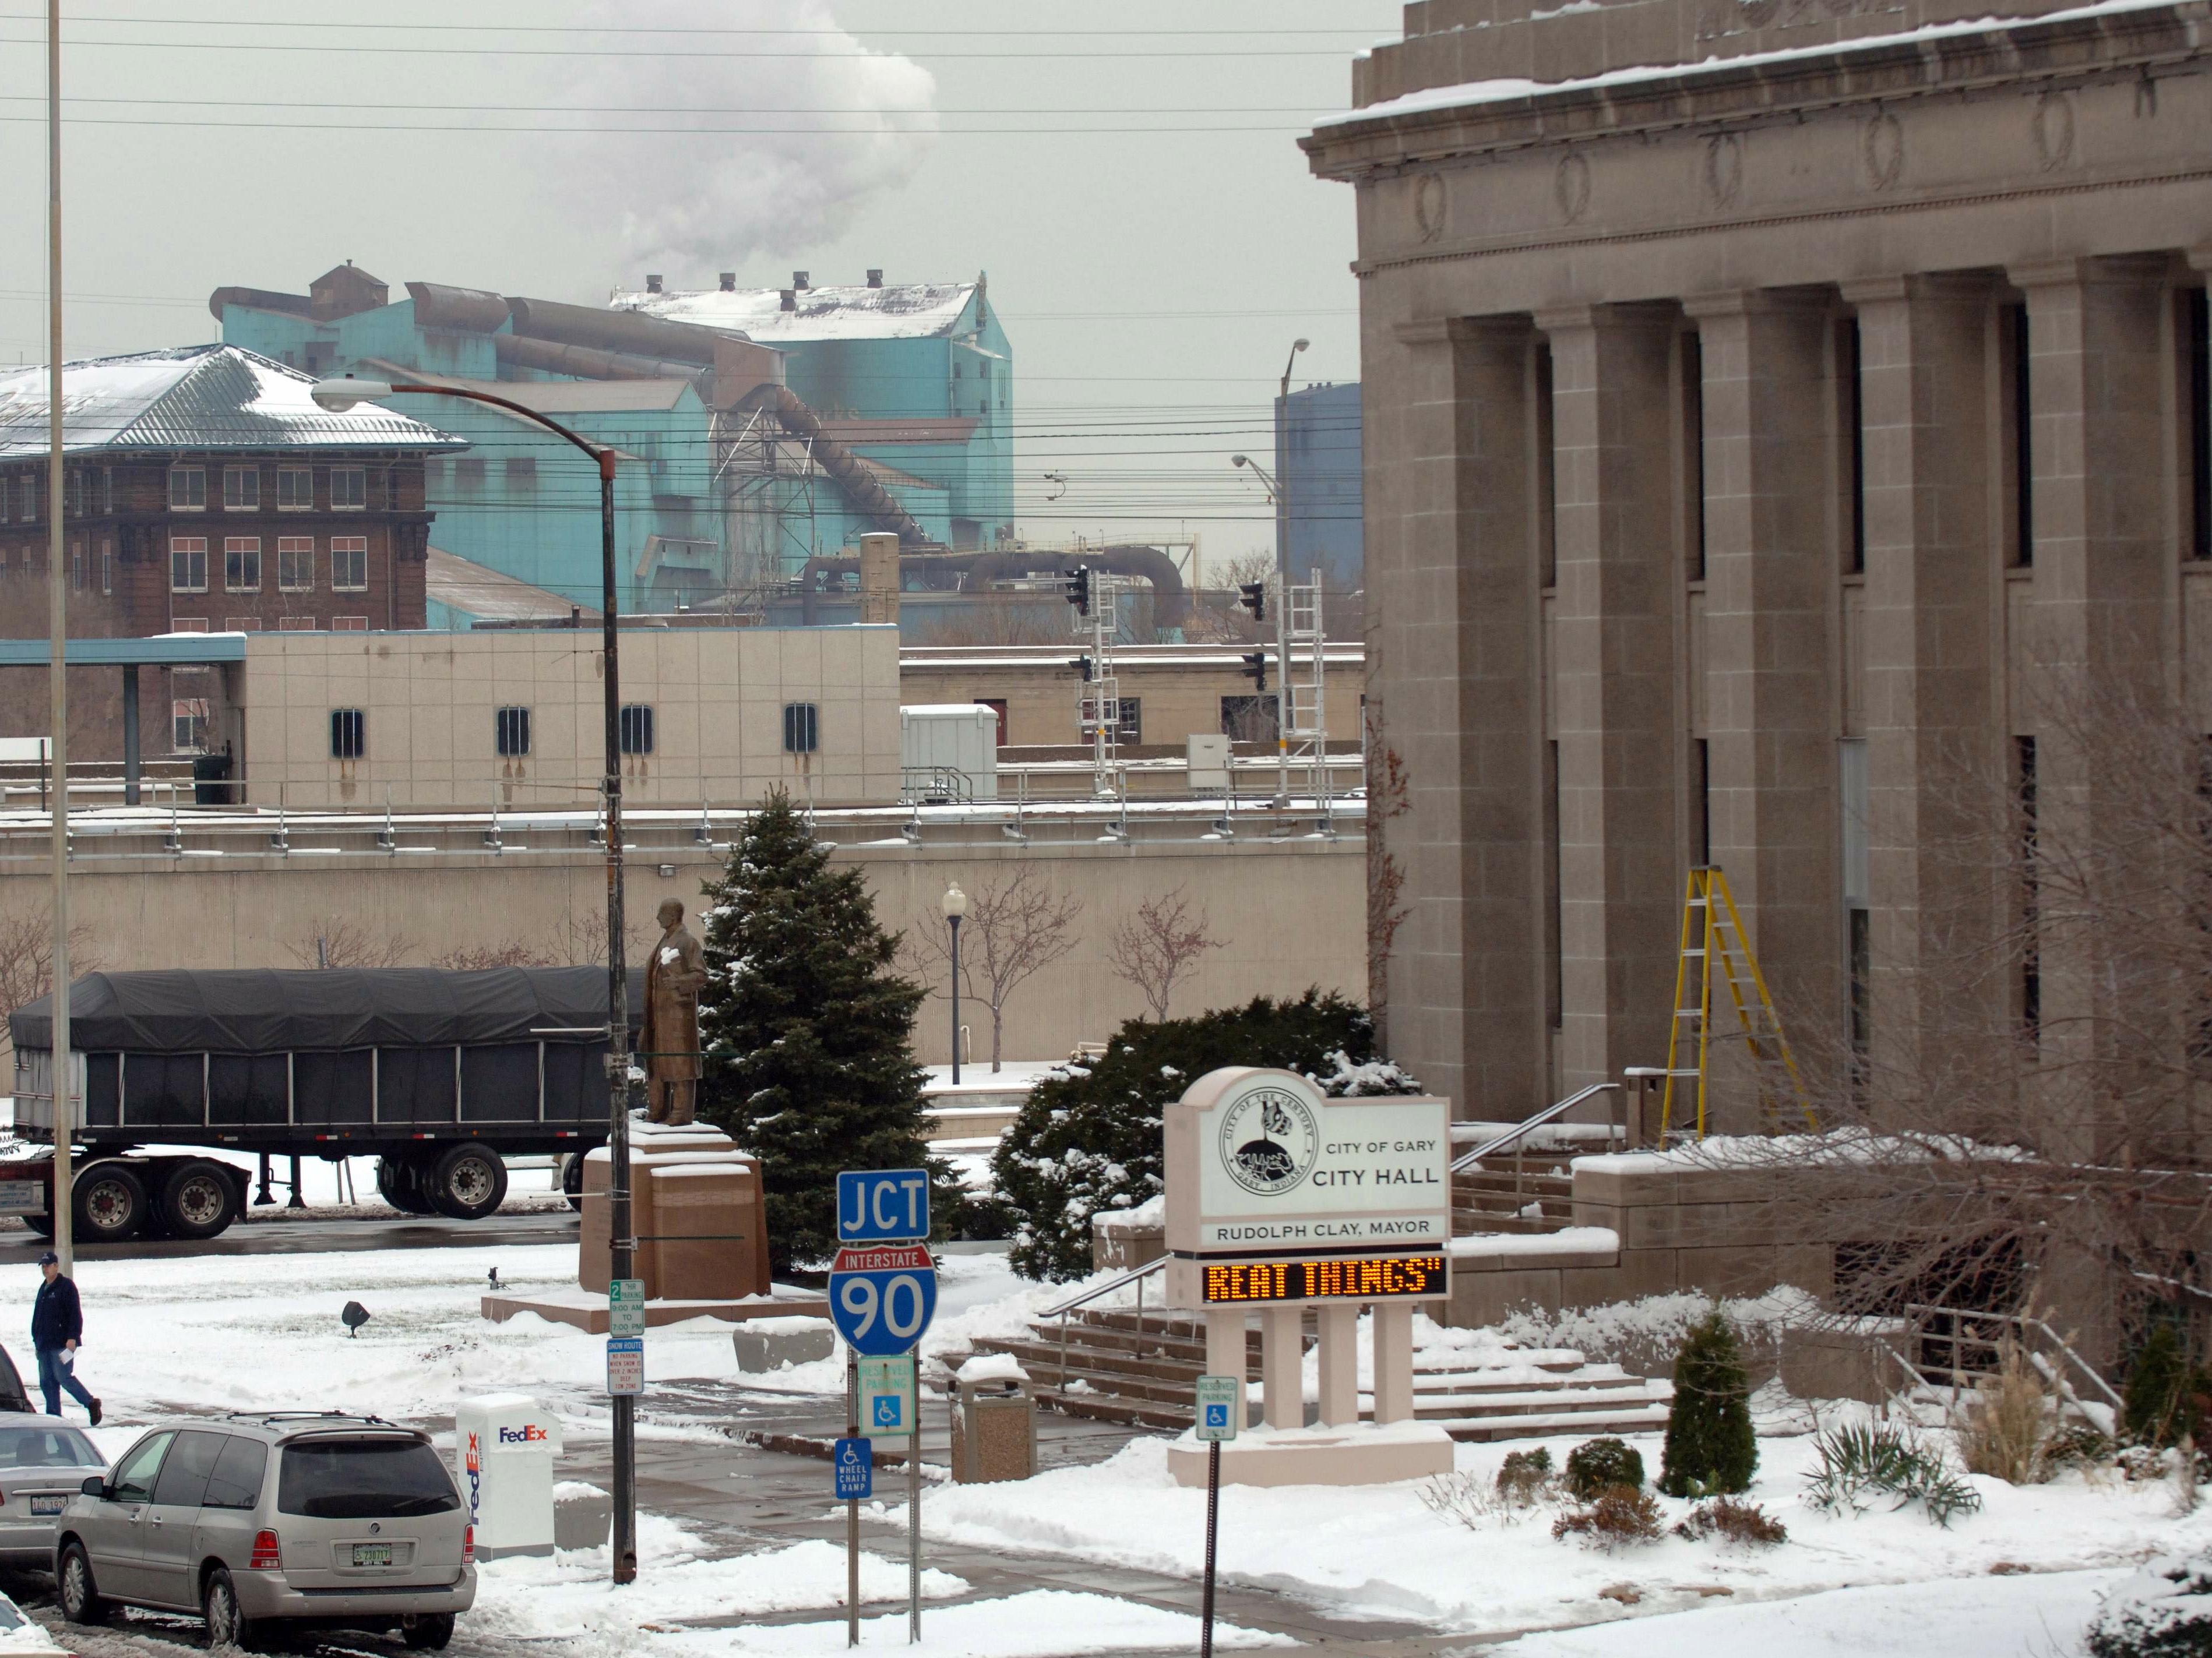 US Steel Icy Shutdown